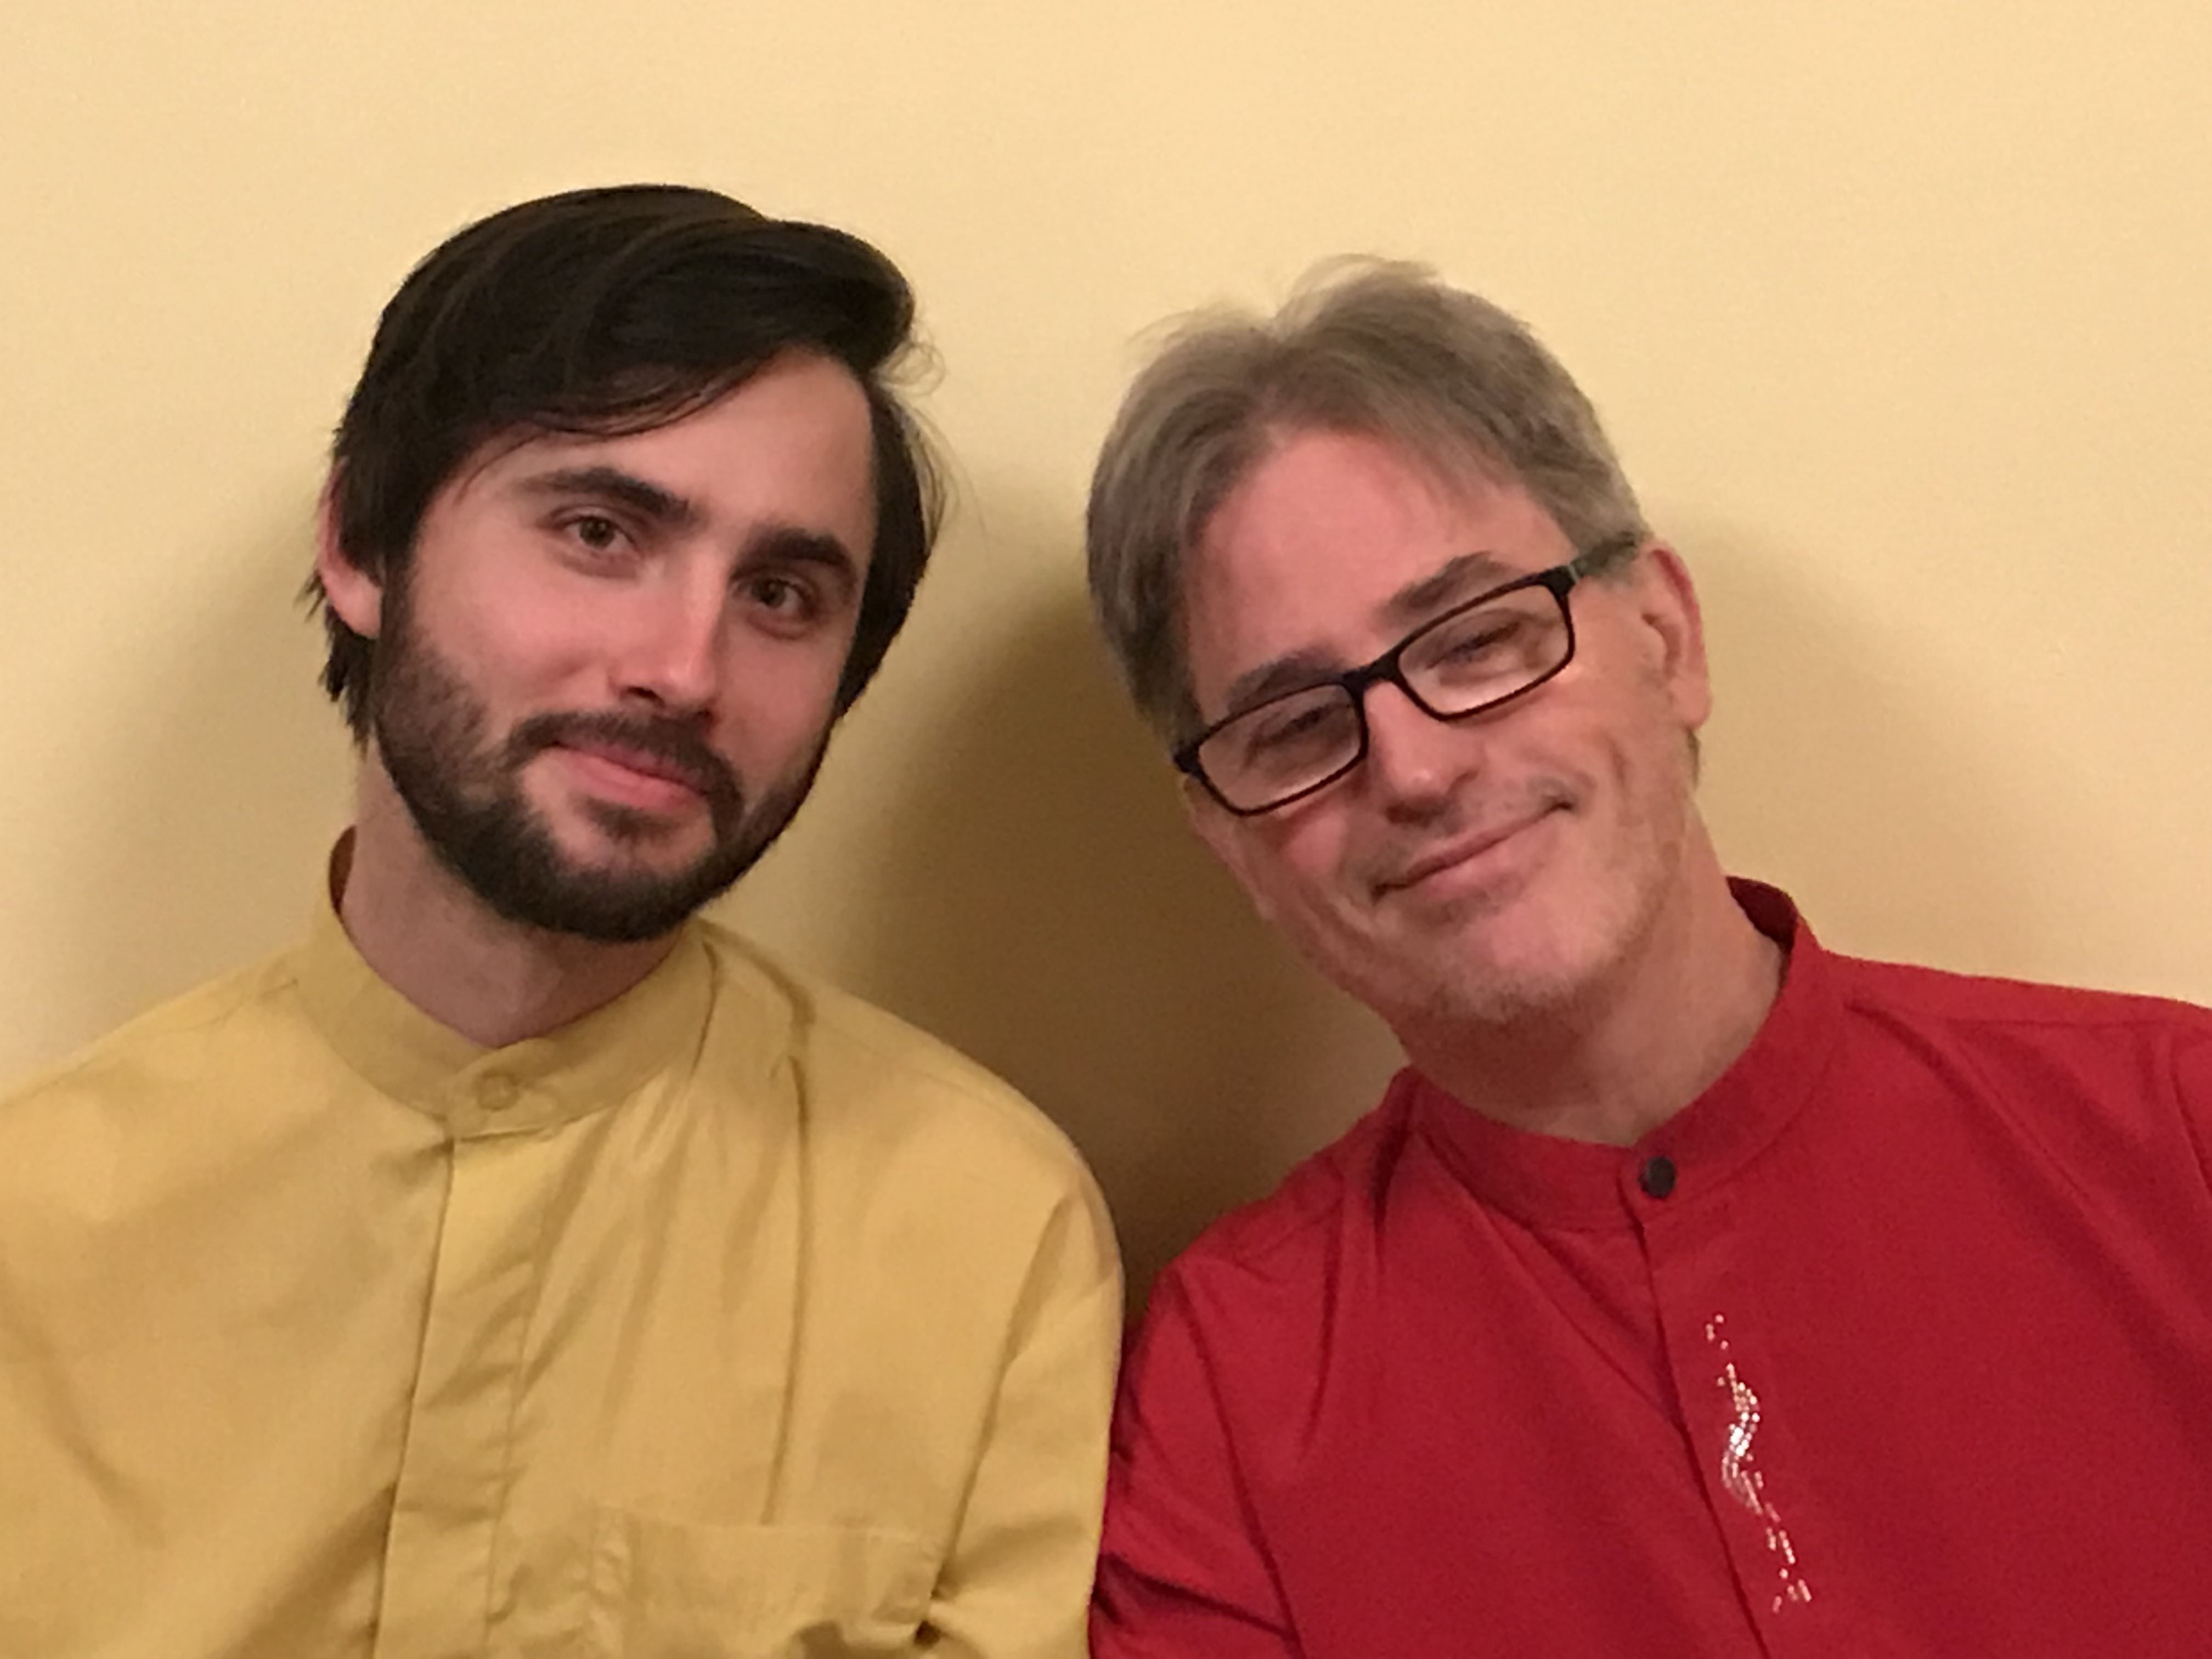 Joe and Tim